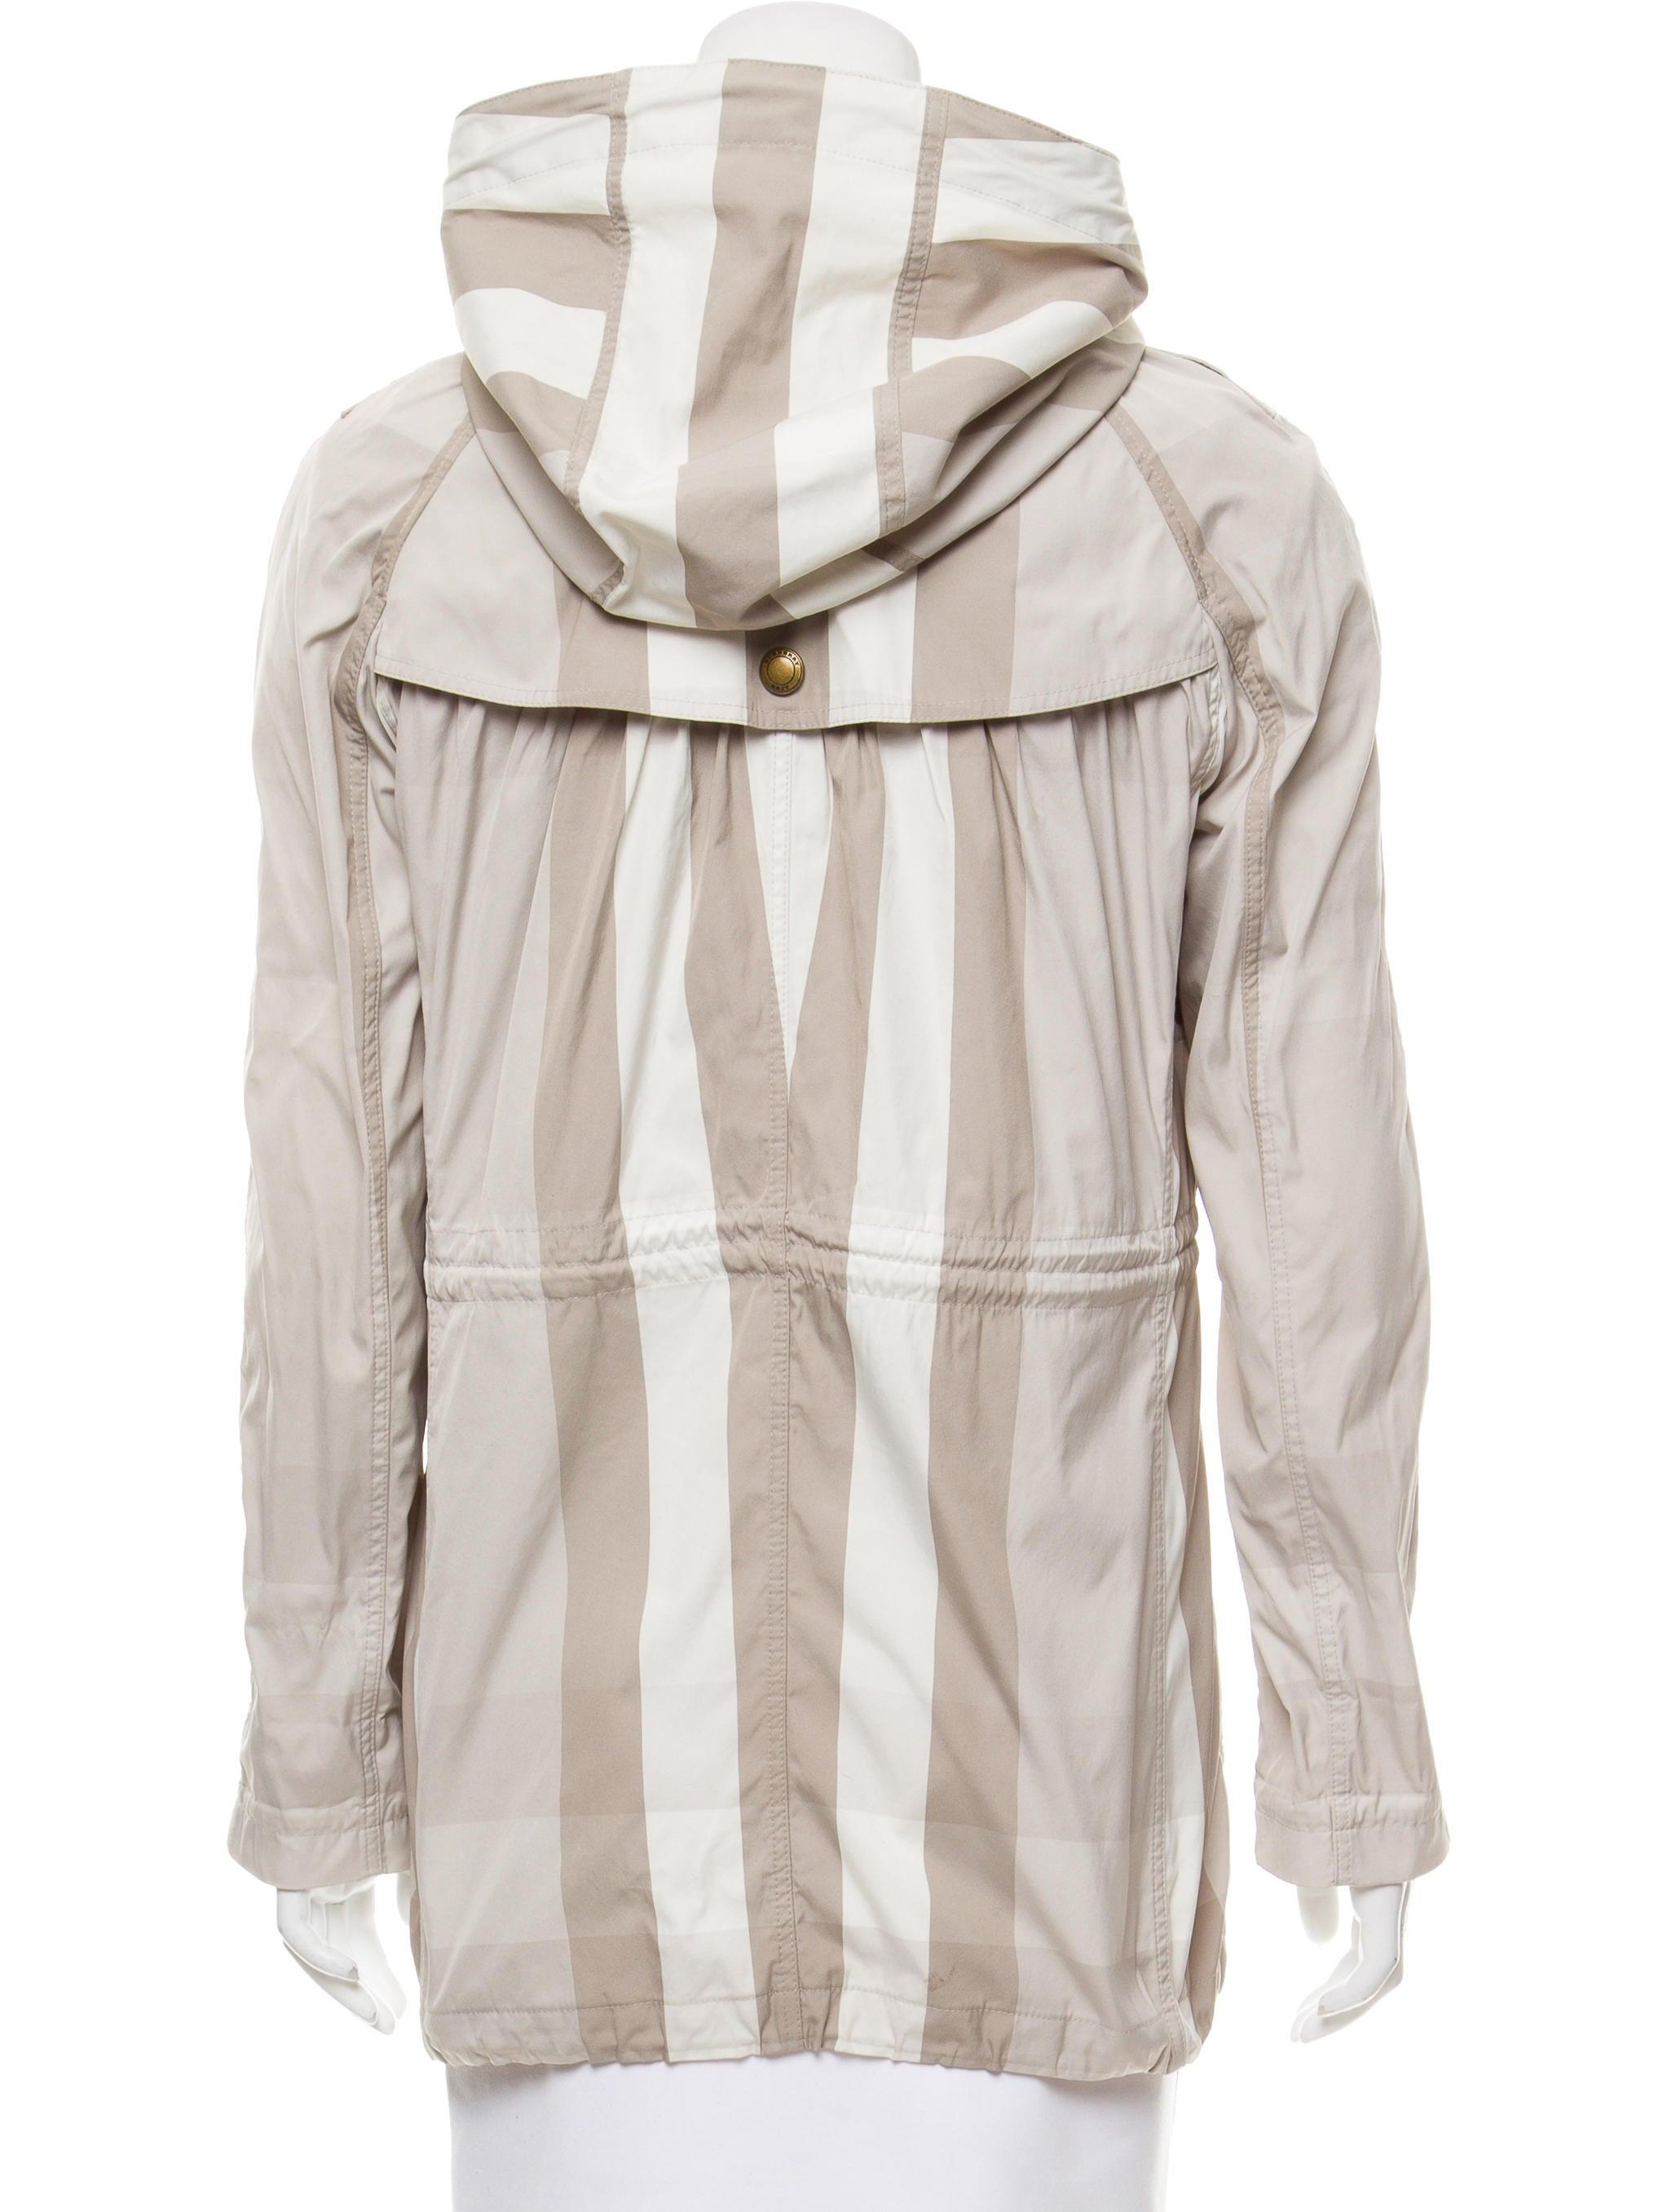 Burberry Brit Lightweight Plaid Jacket Clothing